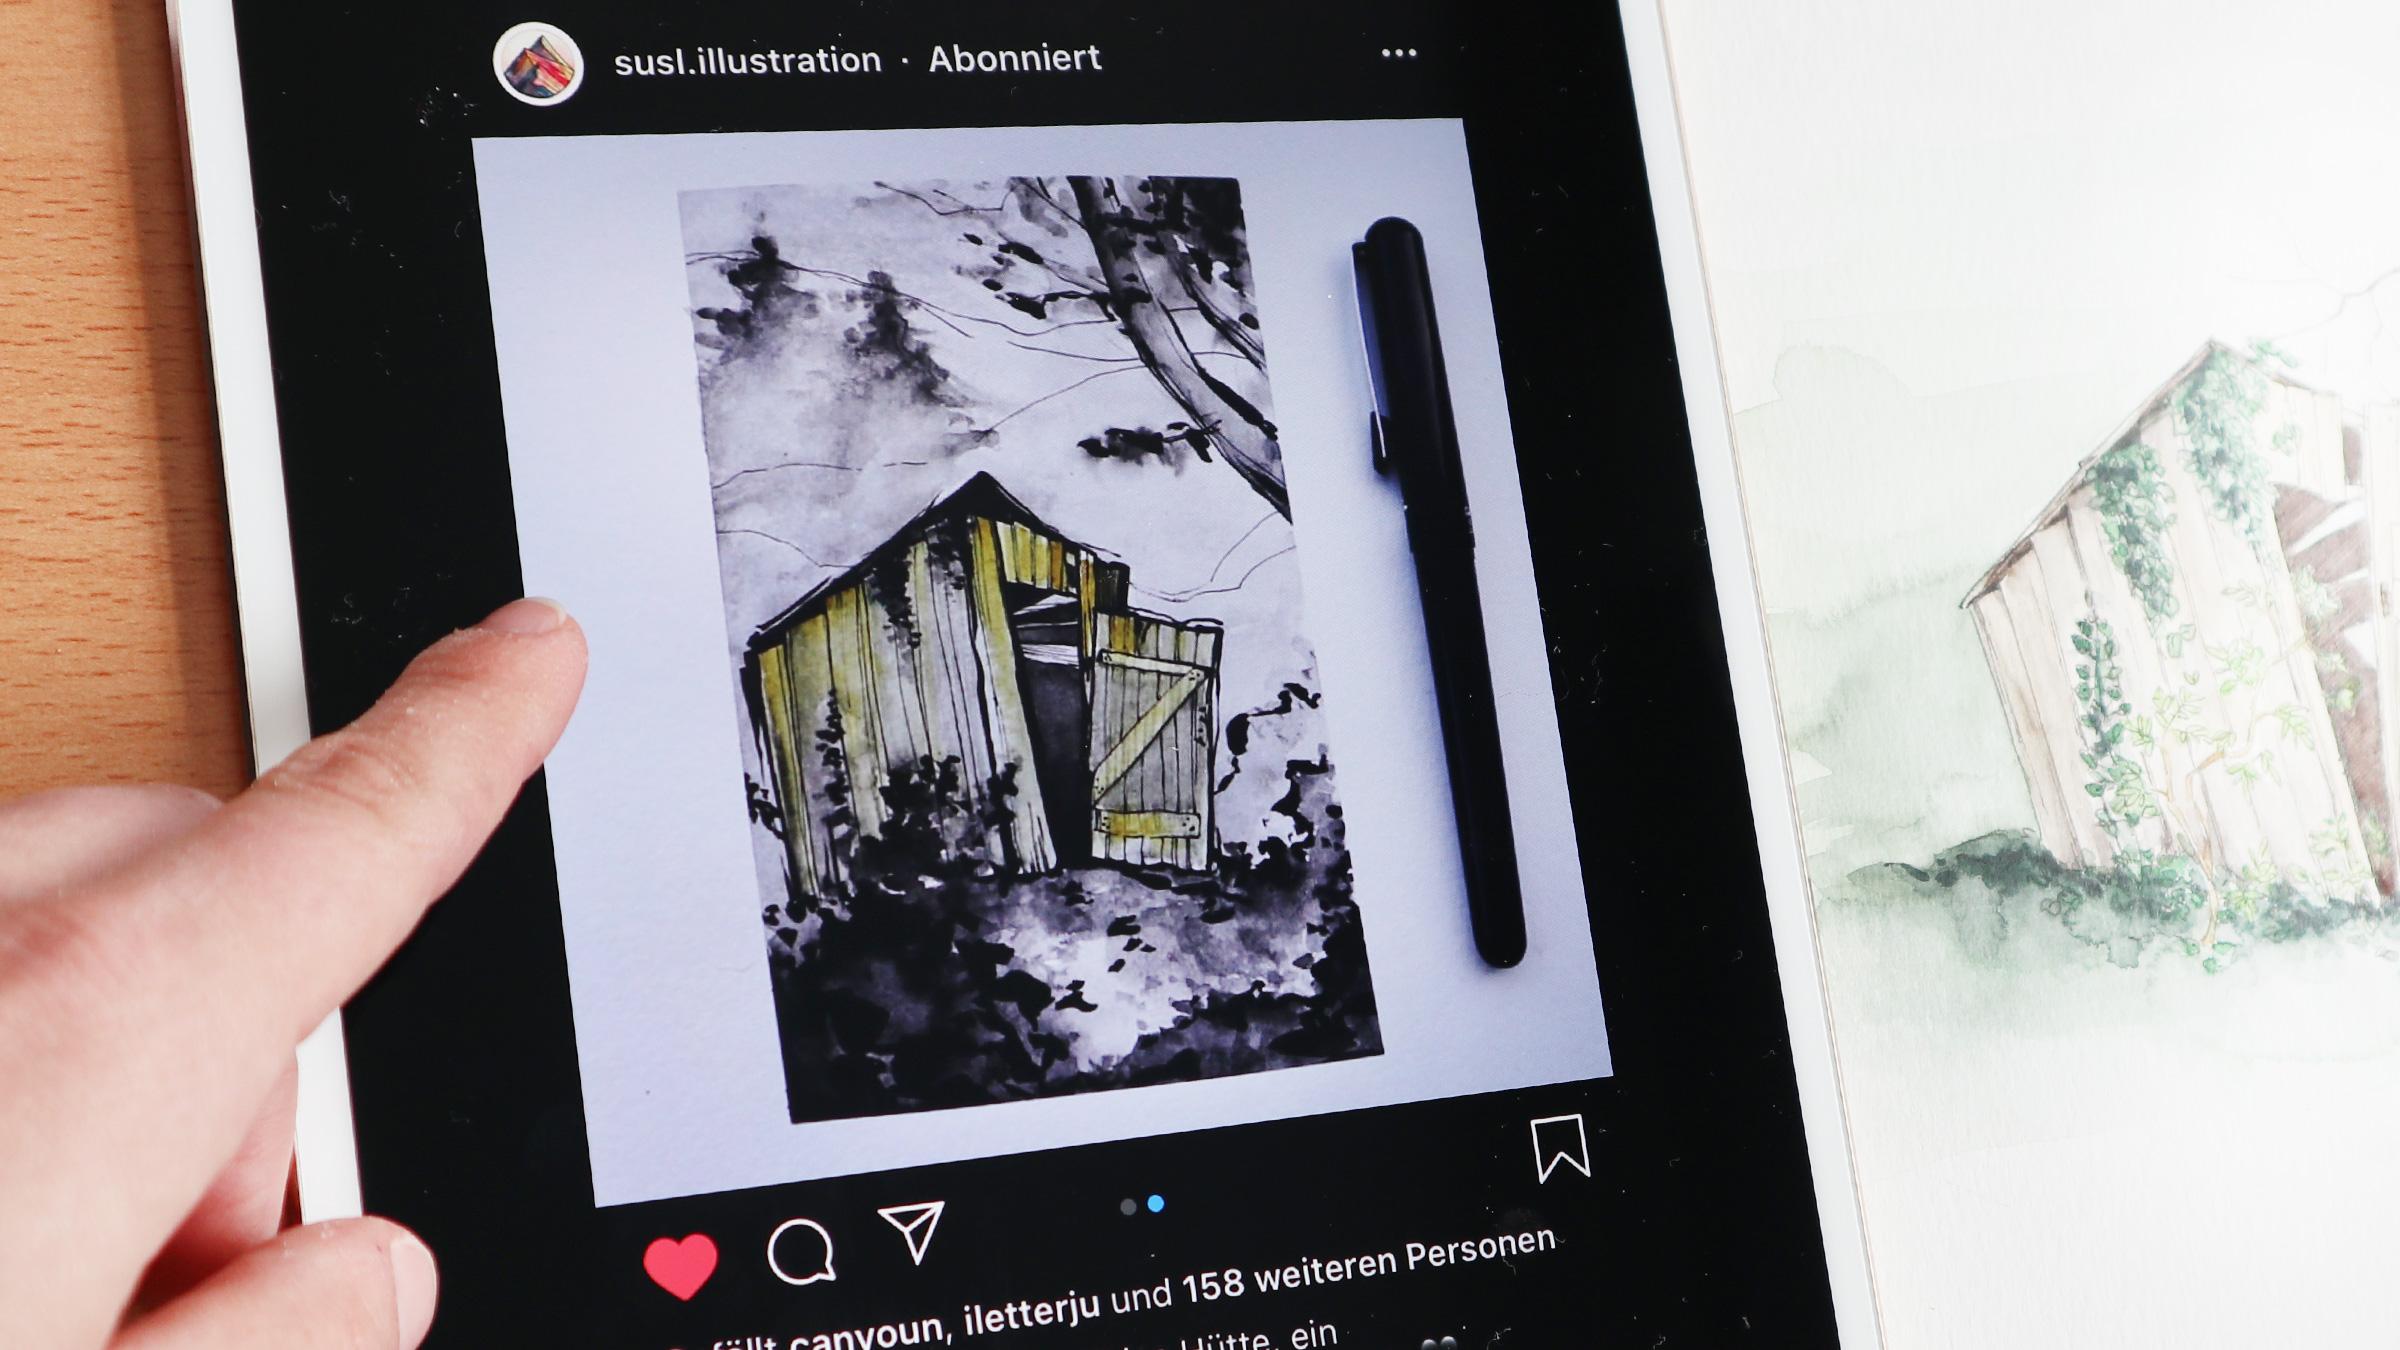 Draw This in Your Style TanteHildasHütte by Susl.Illustration